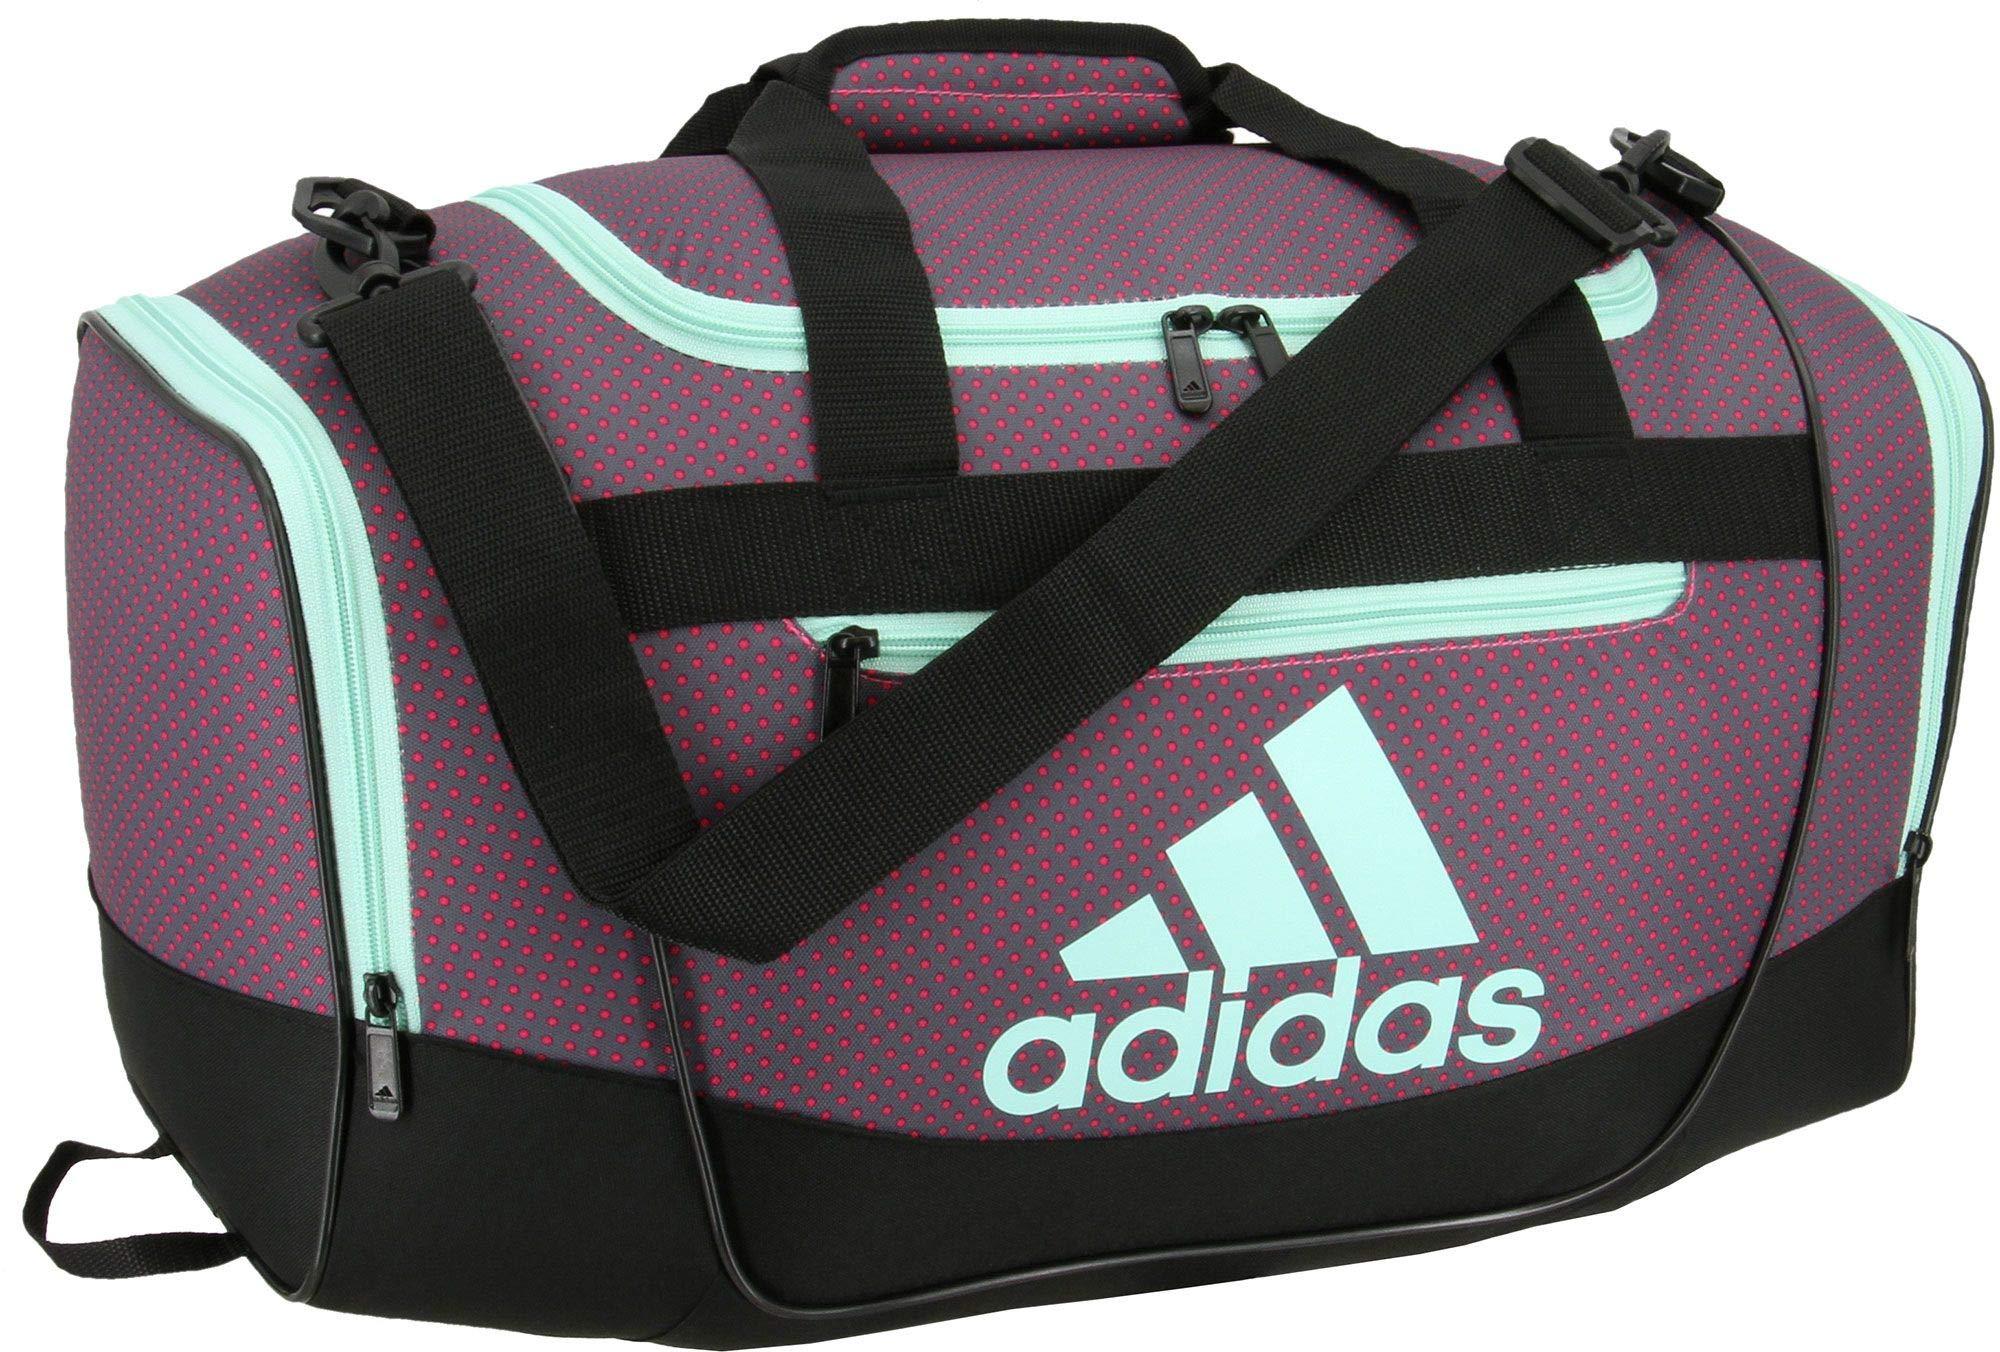 adidas Defender III Small Duffle Bag (Shock Pink Dot)